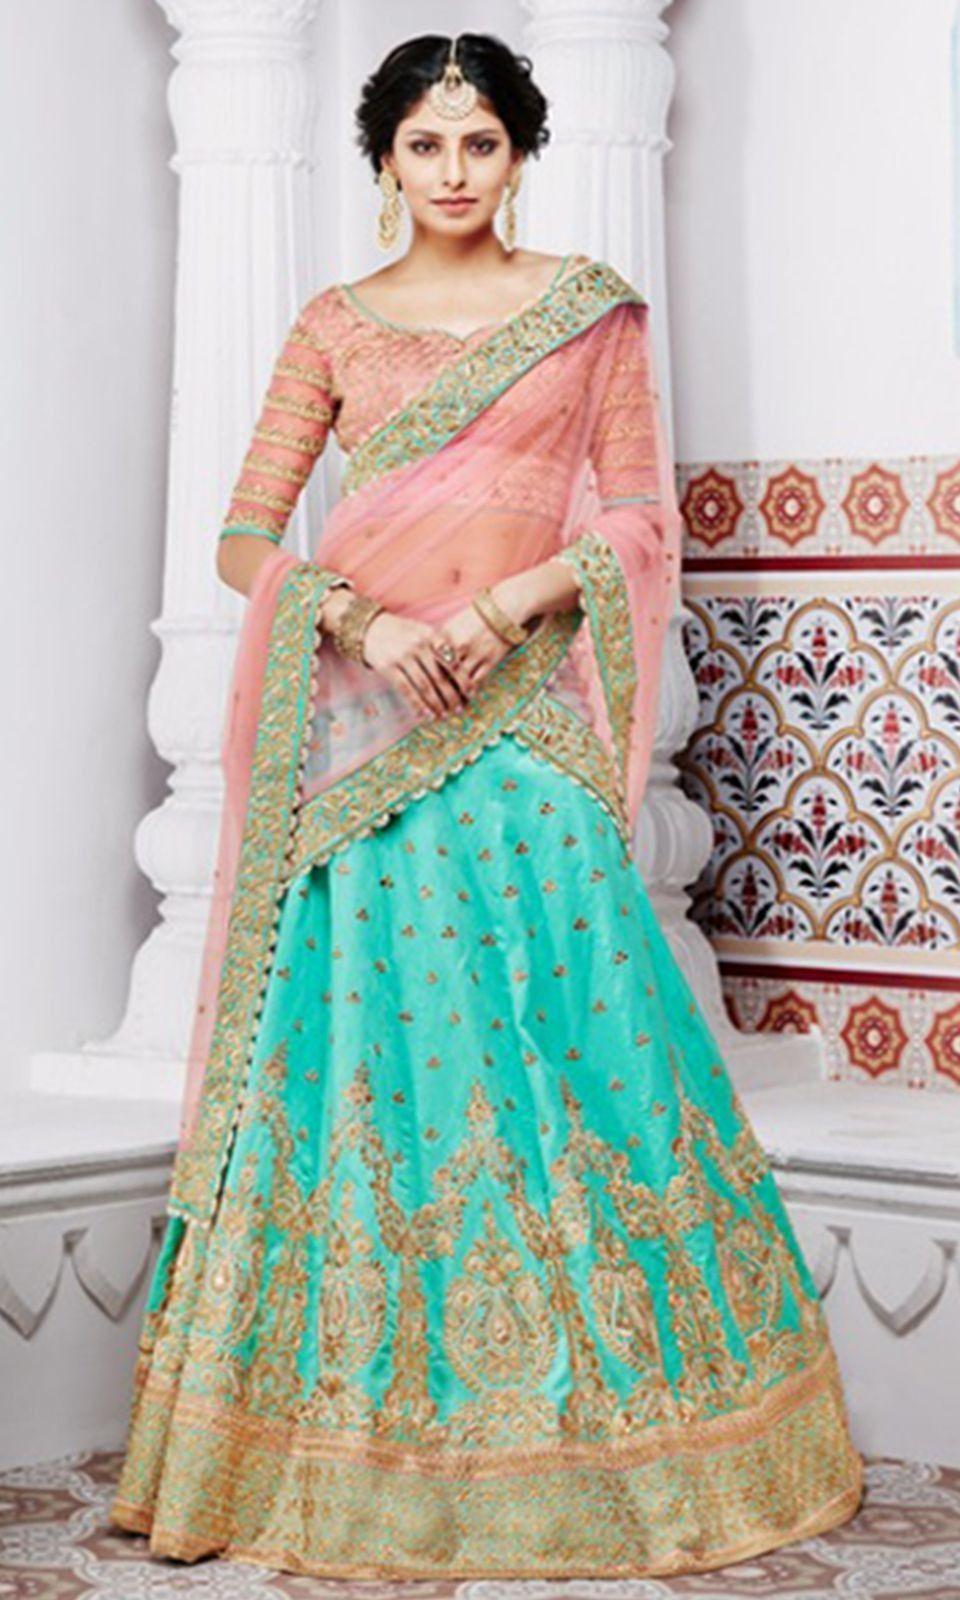 637933c731 Shop this stunning #Peach and #Green #Party Wear #Lehenga #Saree (SKU Code  : LEHNK5094) Online at IshiMaya Fashion.